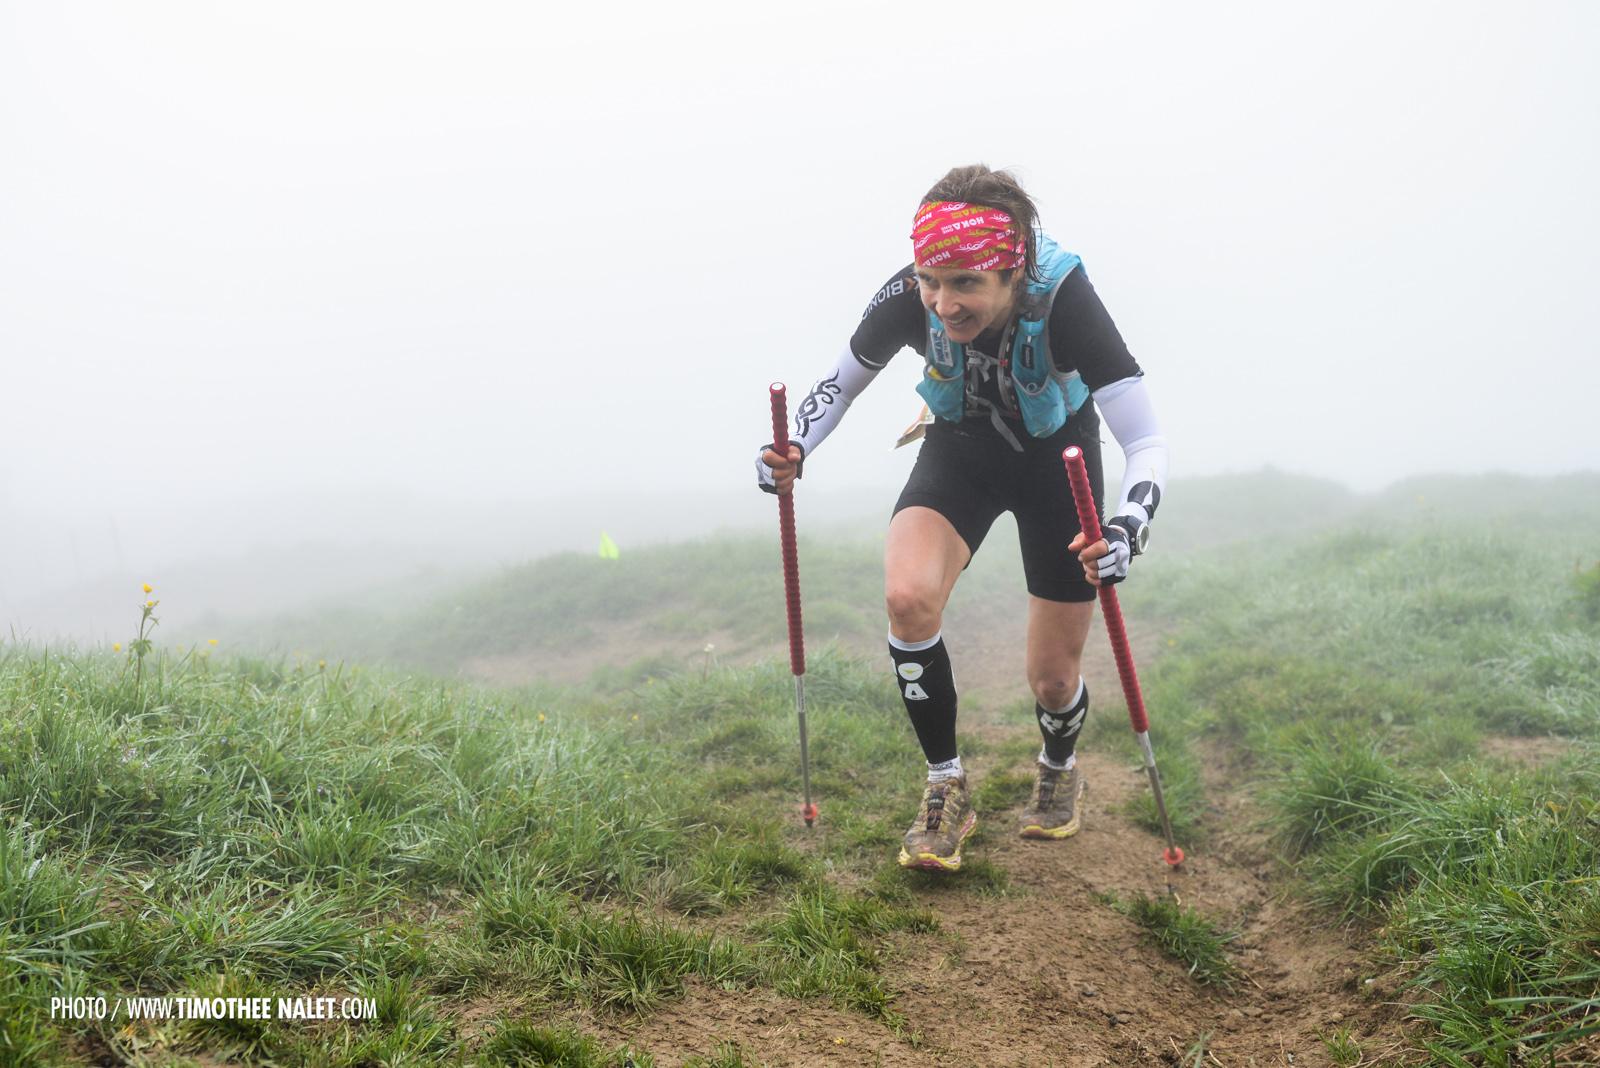 MaxiRace-Annecy-2014-Team-Hoka-Timothee-Nalet-1106.jpg